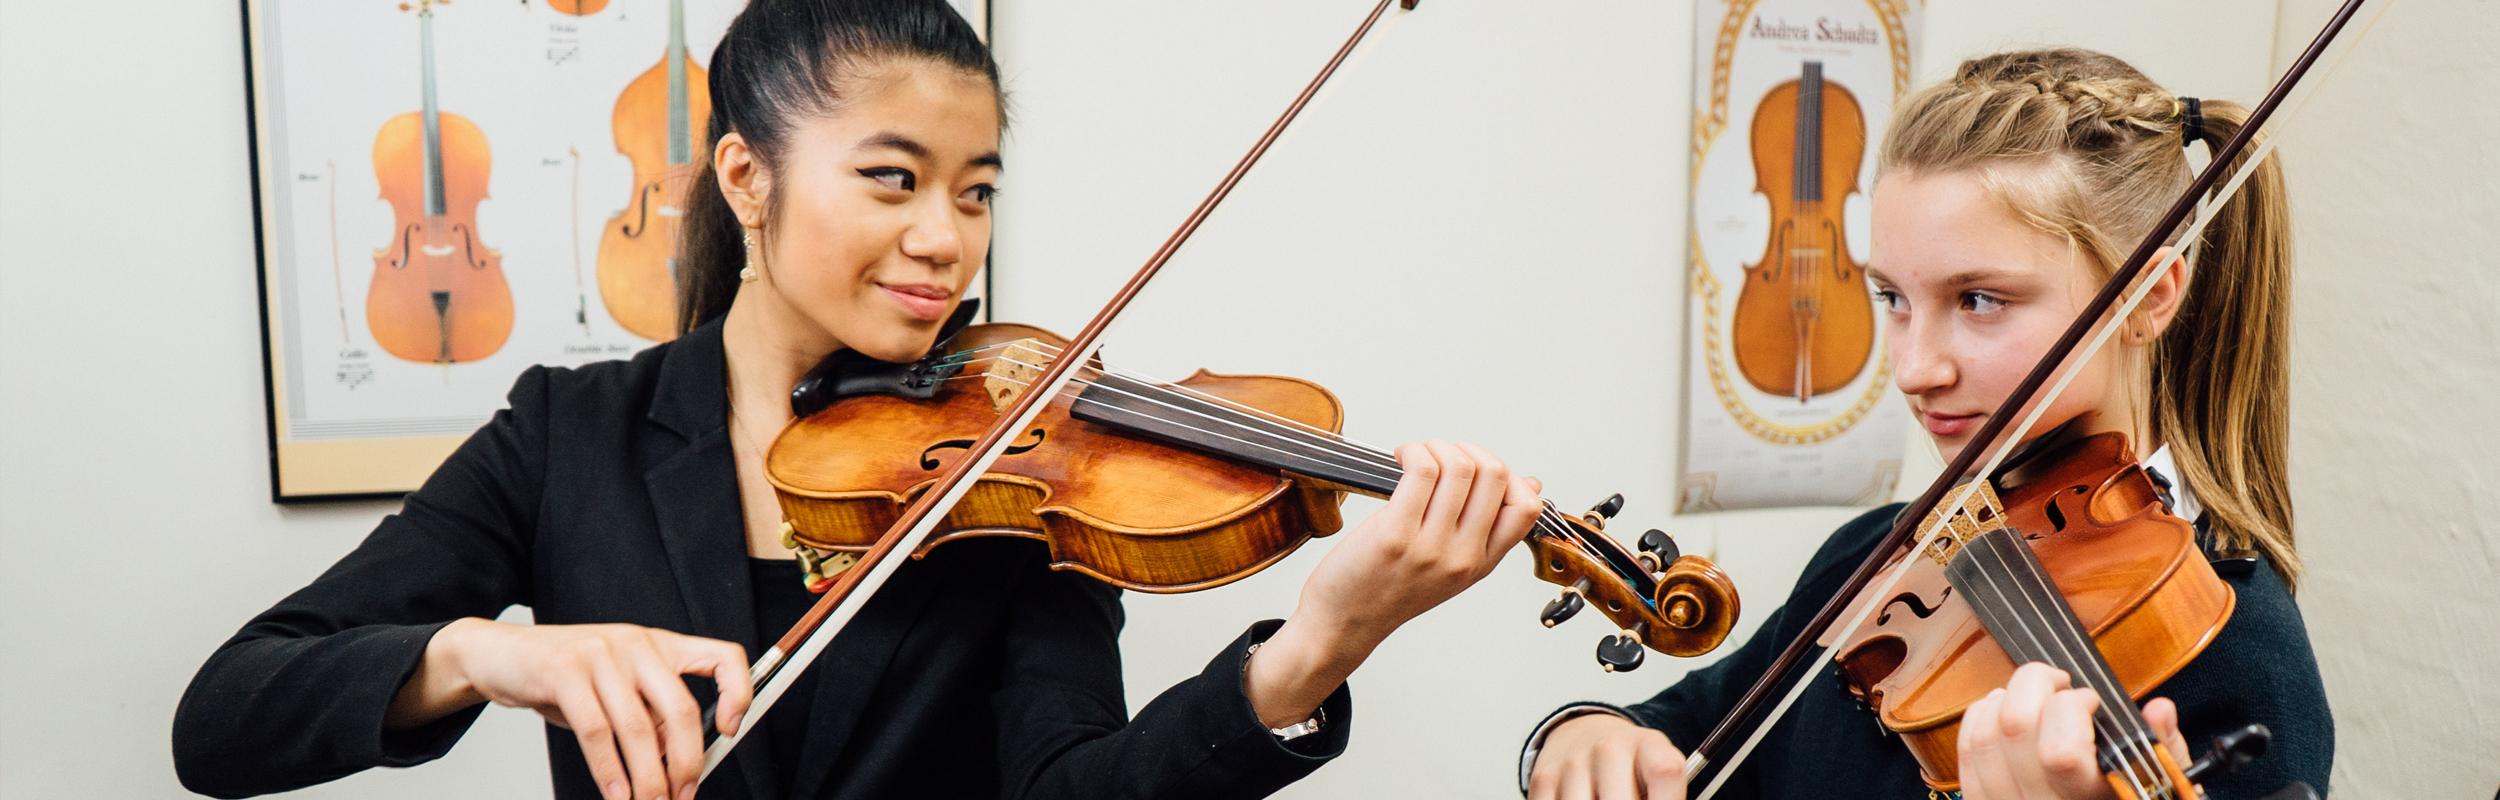 Girl enjoying a violin lesson